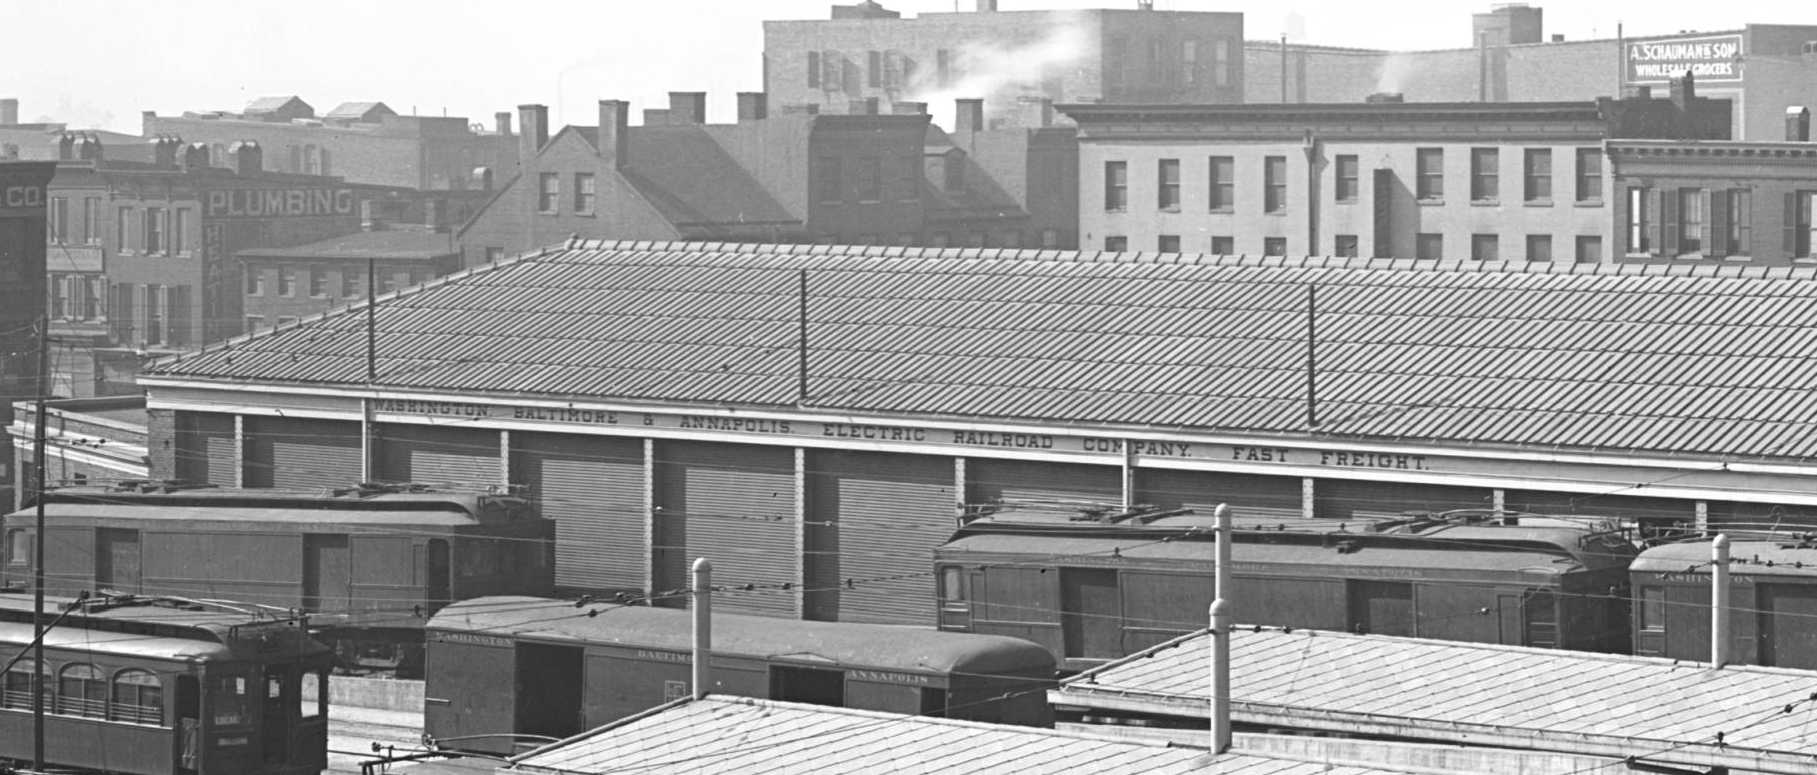 Washington-Baltimore-and-Annapolis-Railroad-Baltimore-Freight-Station-1223.PNG